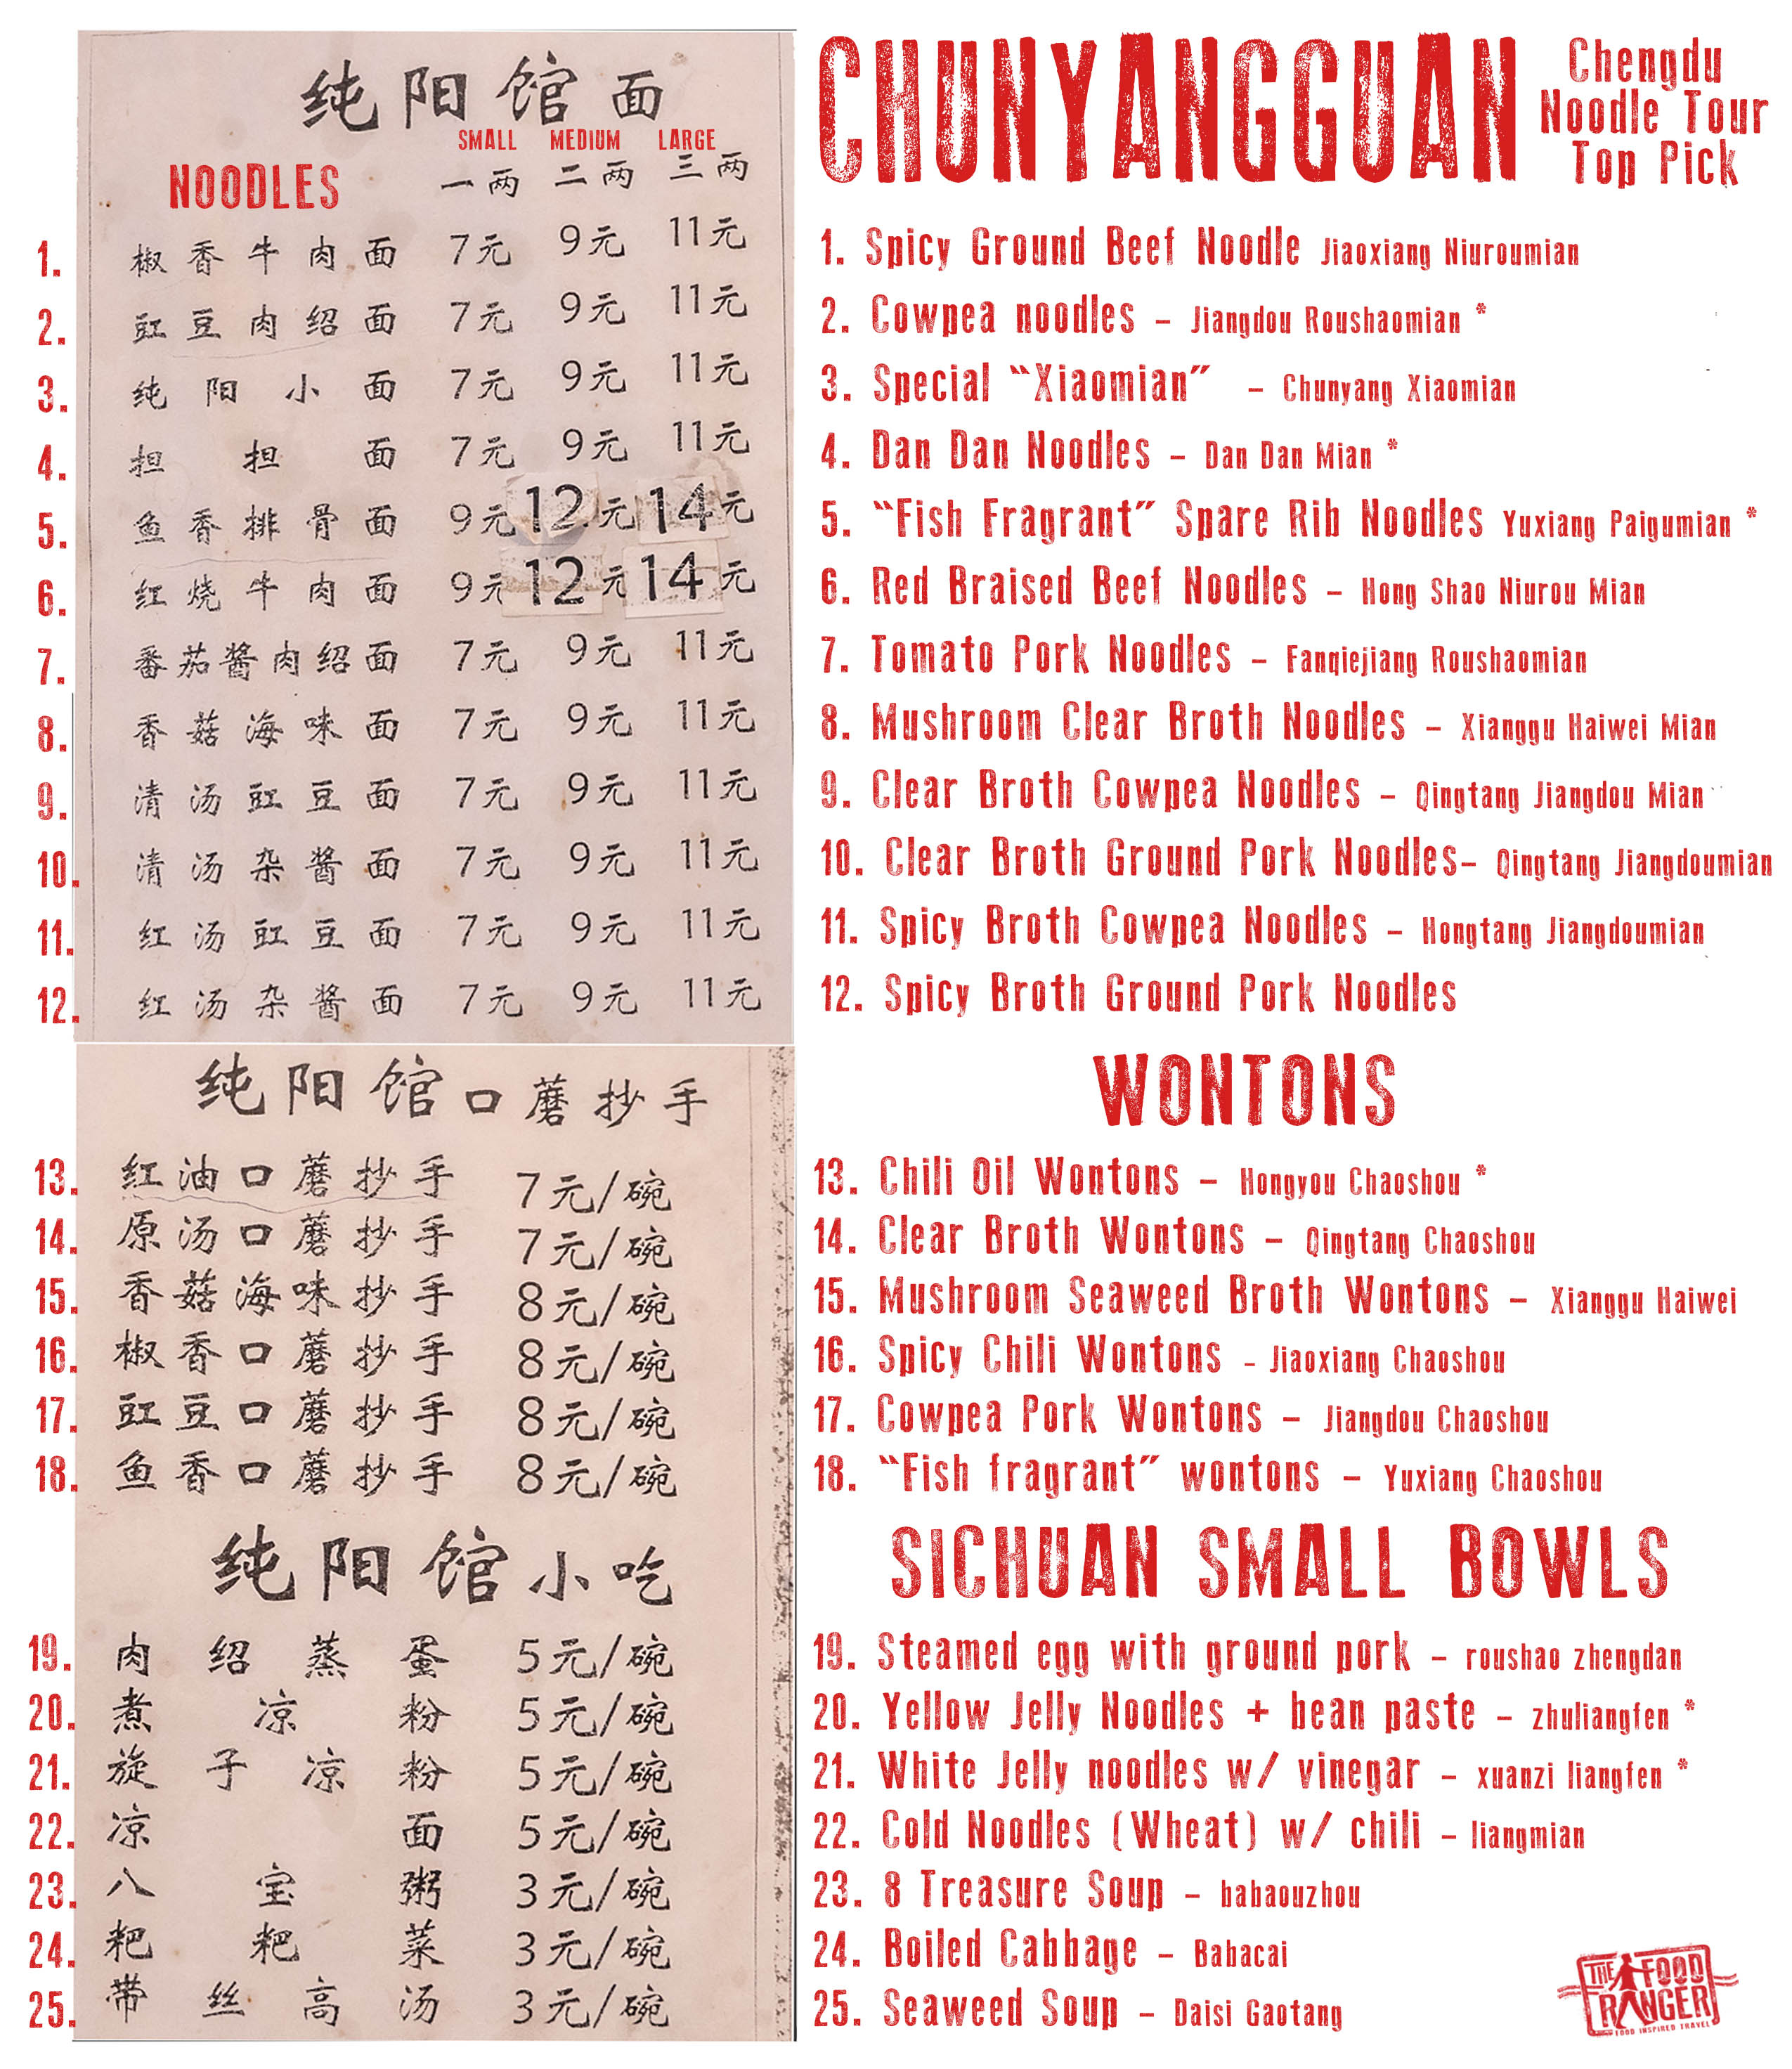 translated restaurant menu at chunyangguan